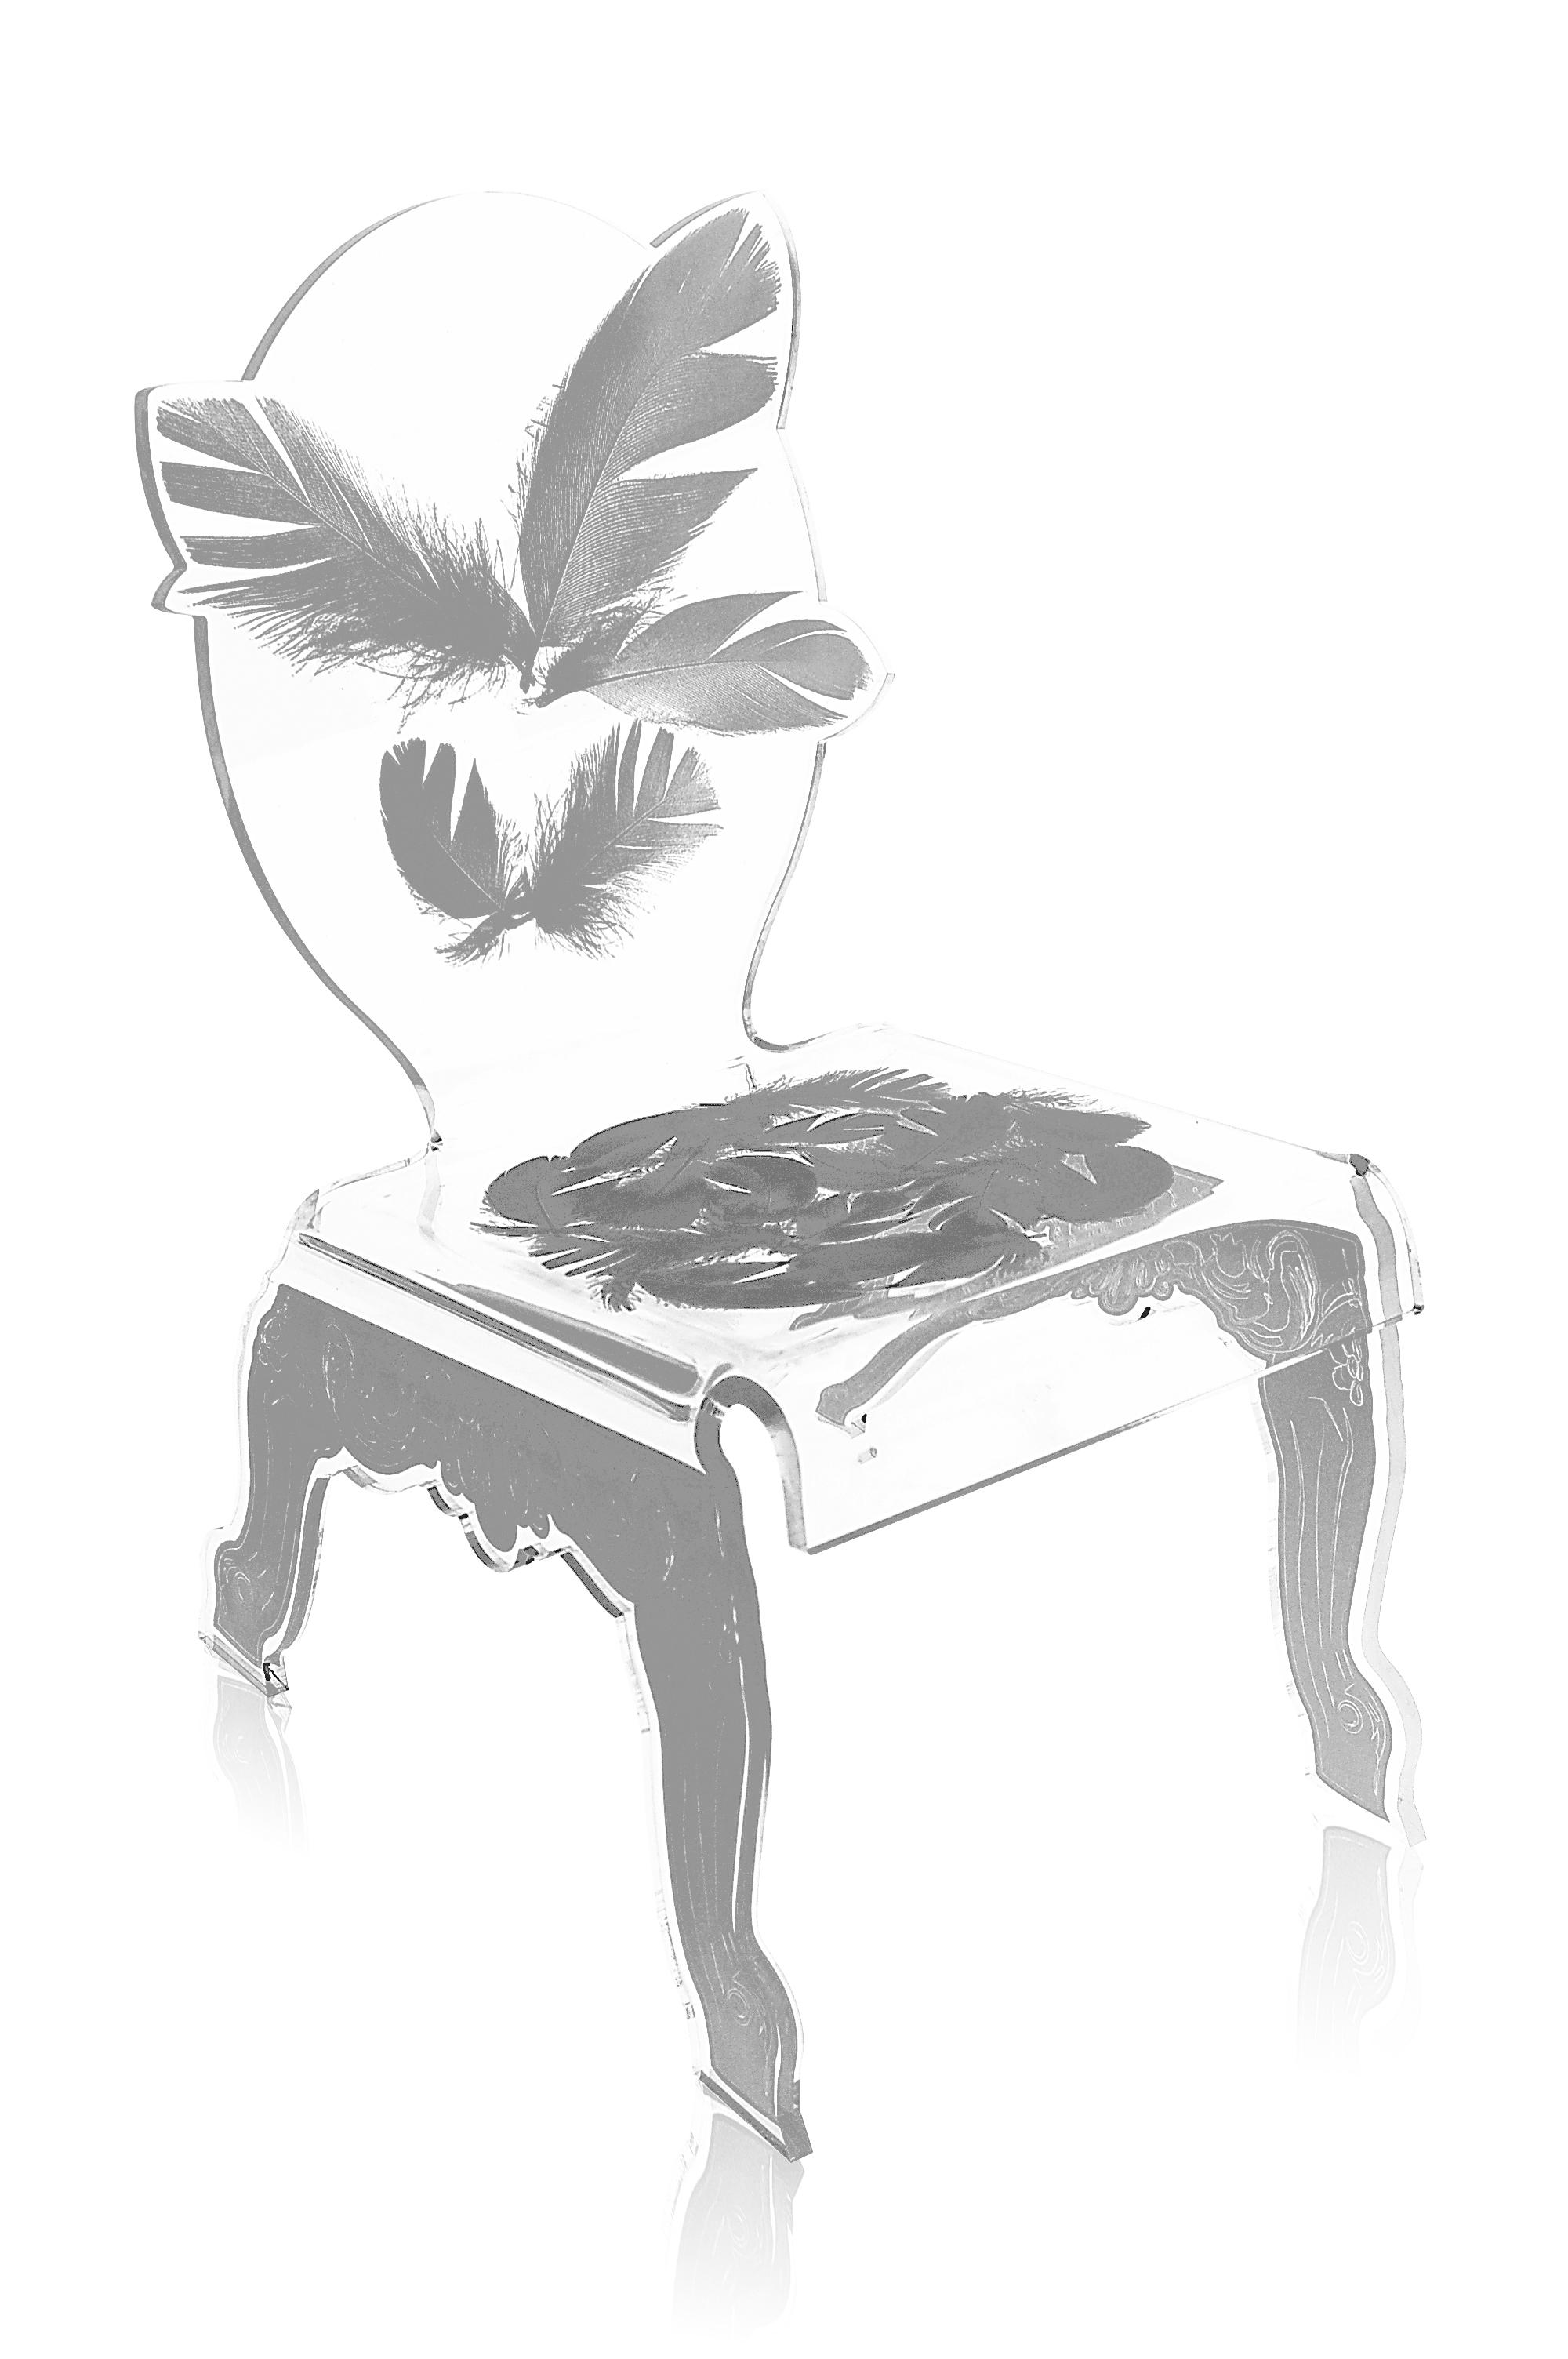 relax plume fond blanc2.jpg